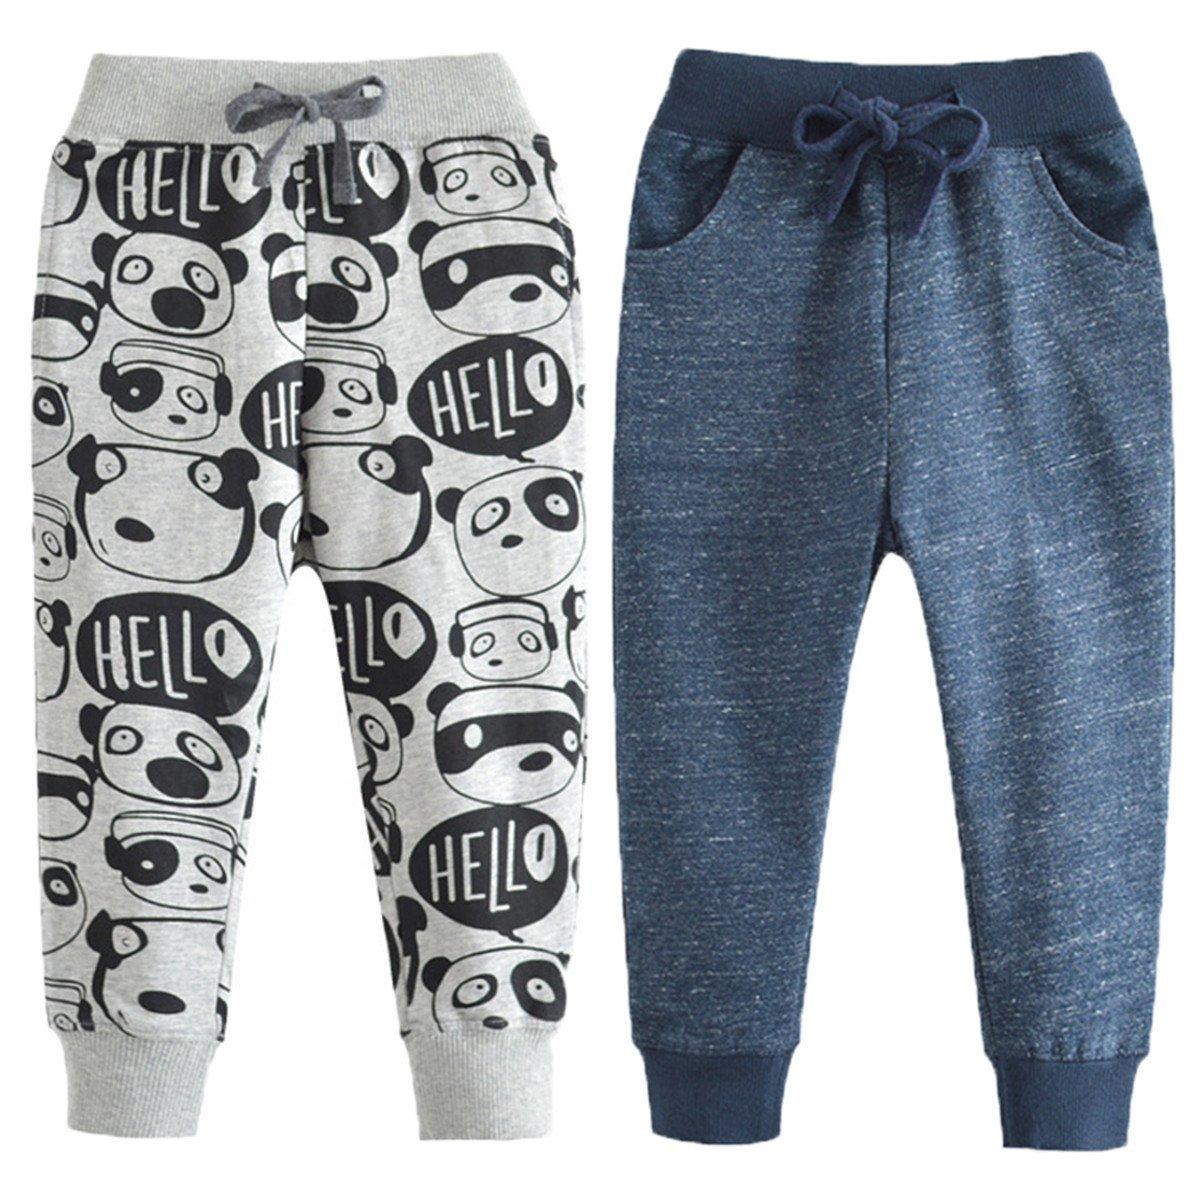 REWANGOING 2 Pack of Little Boys Cartoon Print Drawstring Elastic Sweatpants Sport Jogger 4T